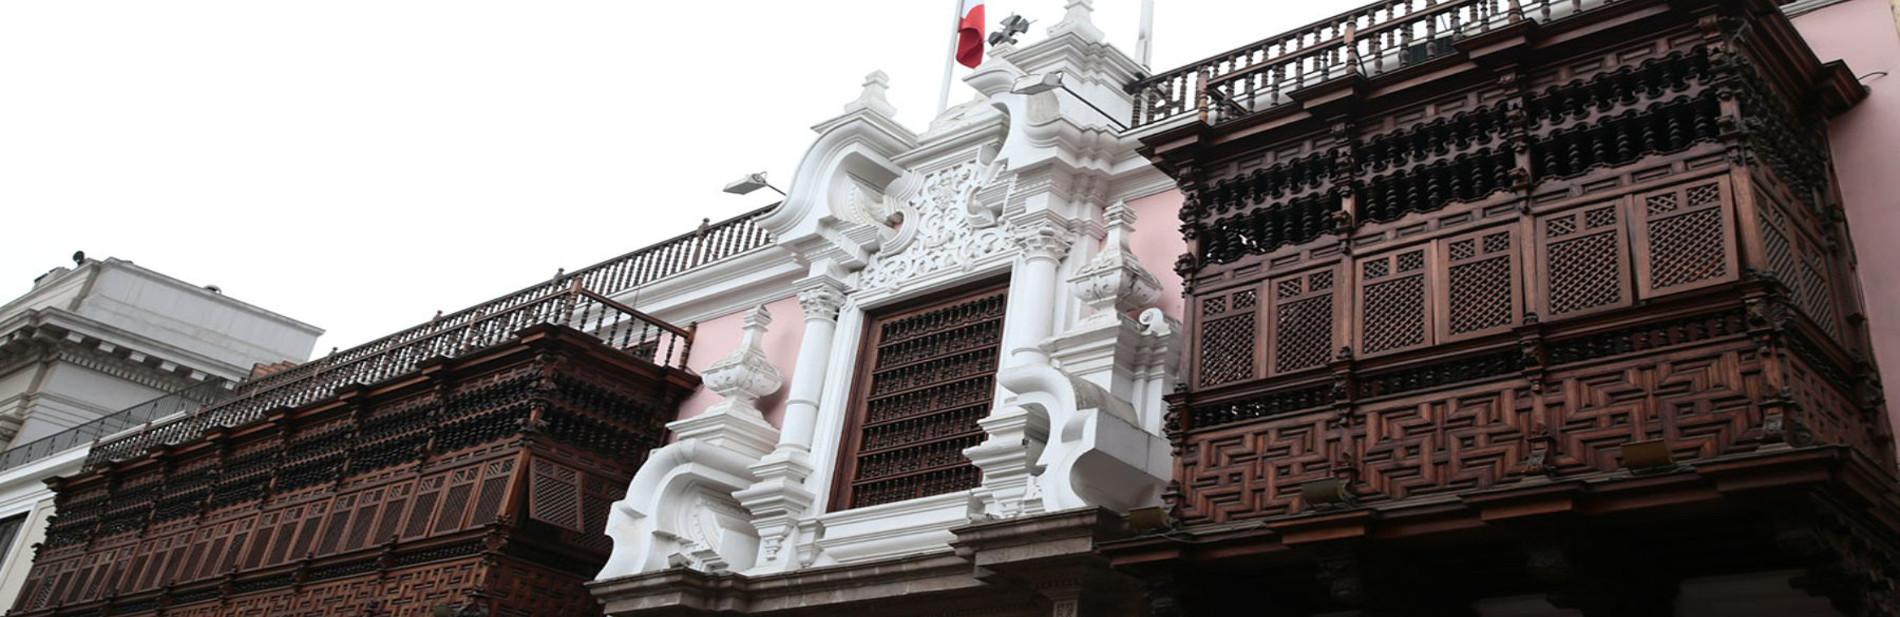 Consulta Ministerio De Relaciones Exteriores De Guatemala